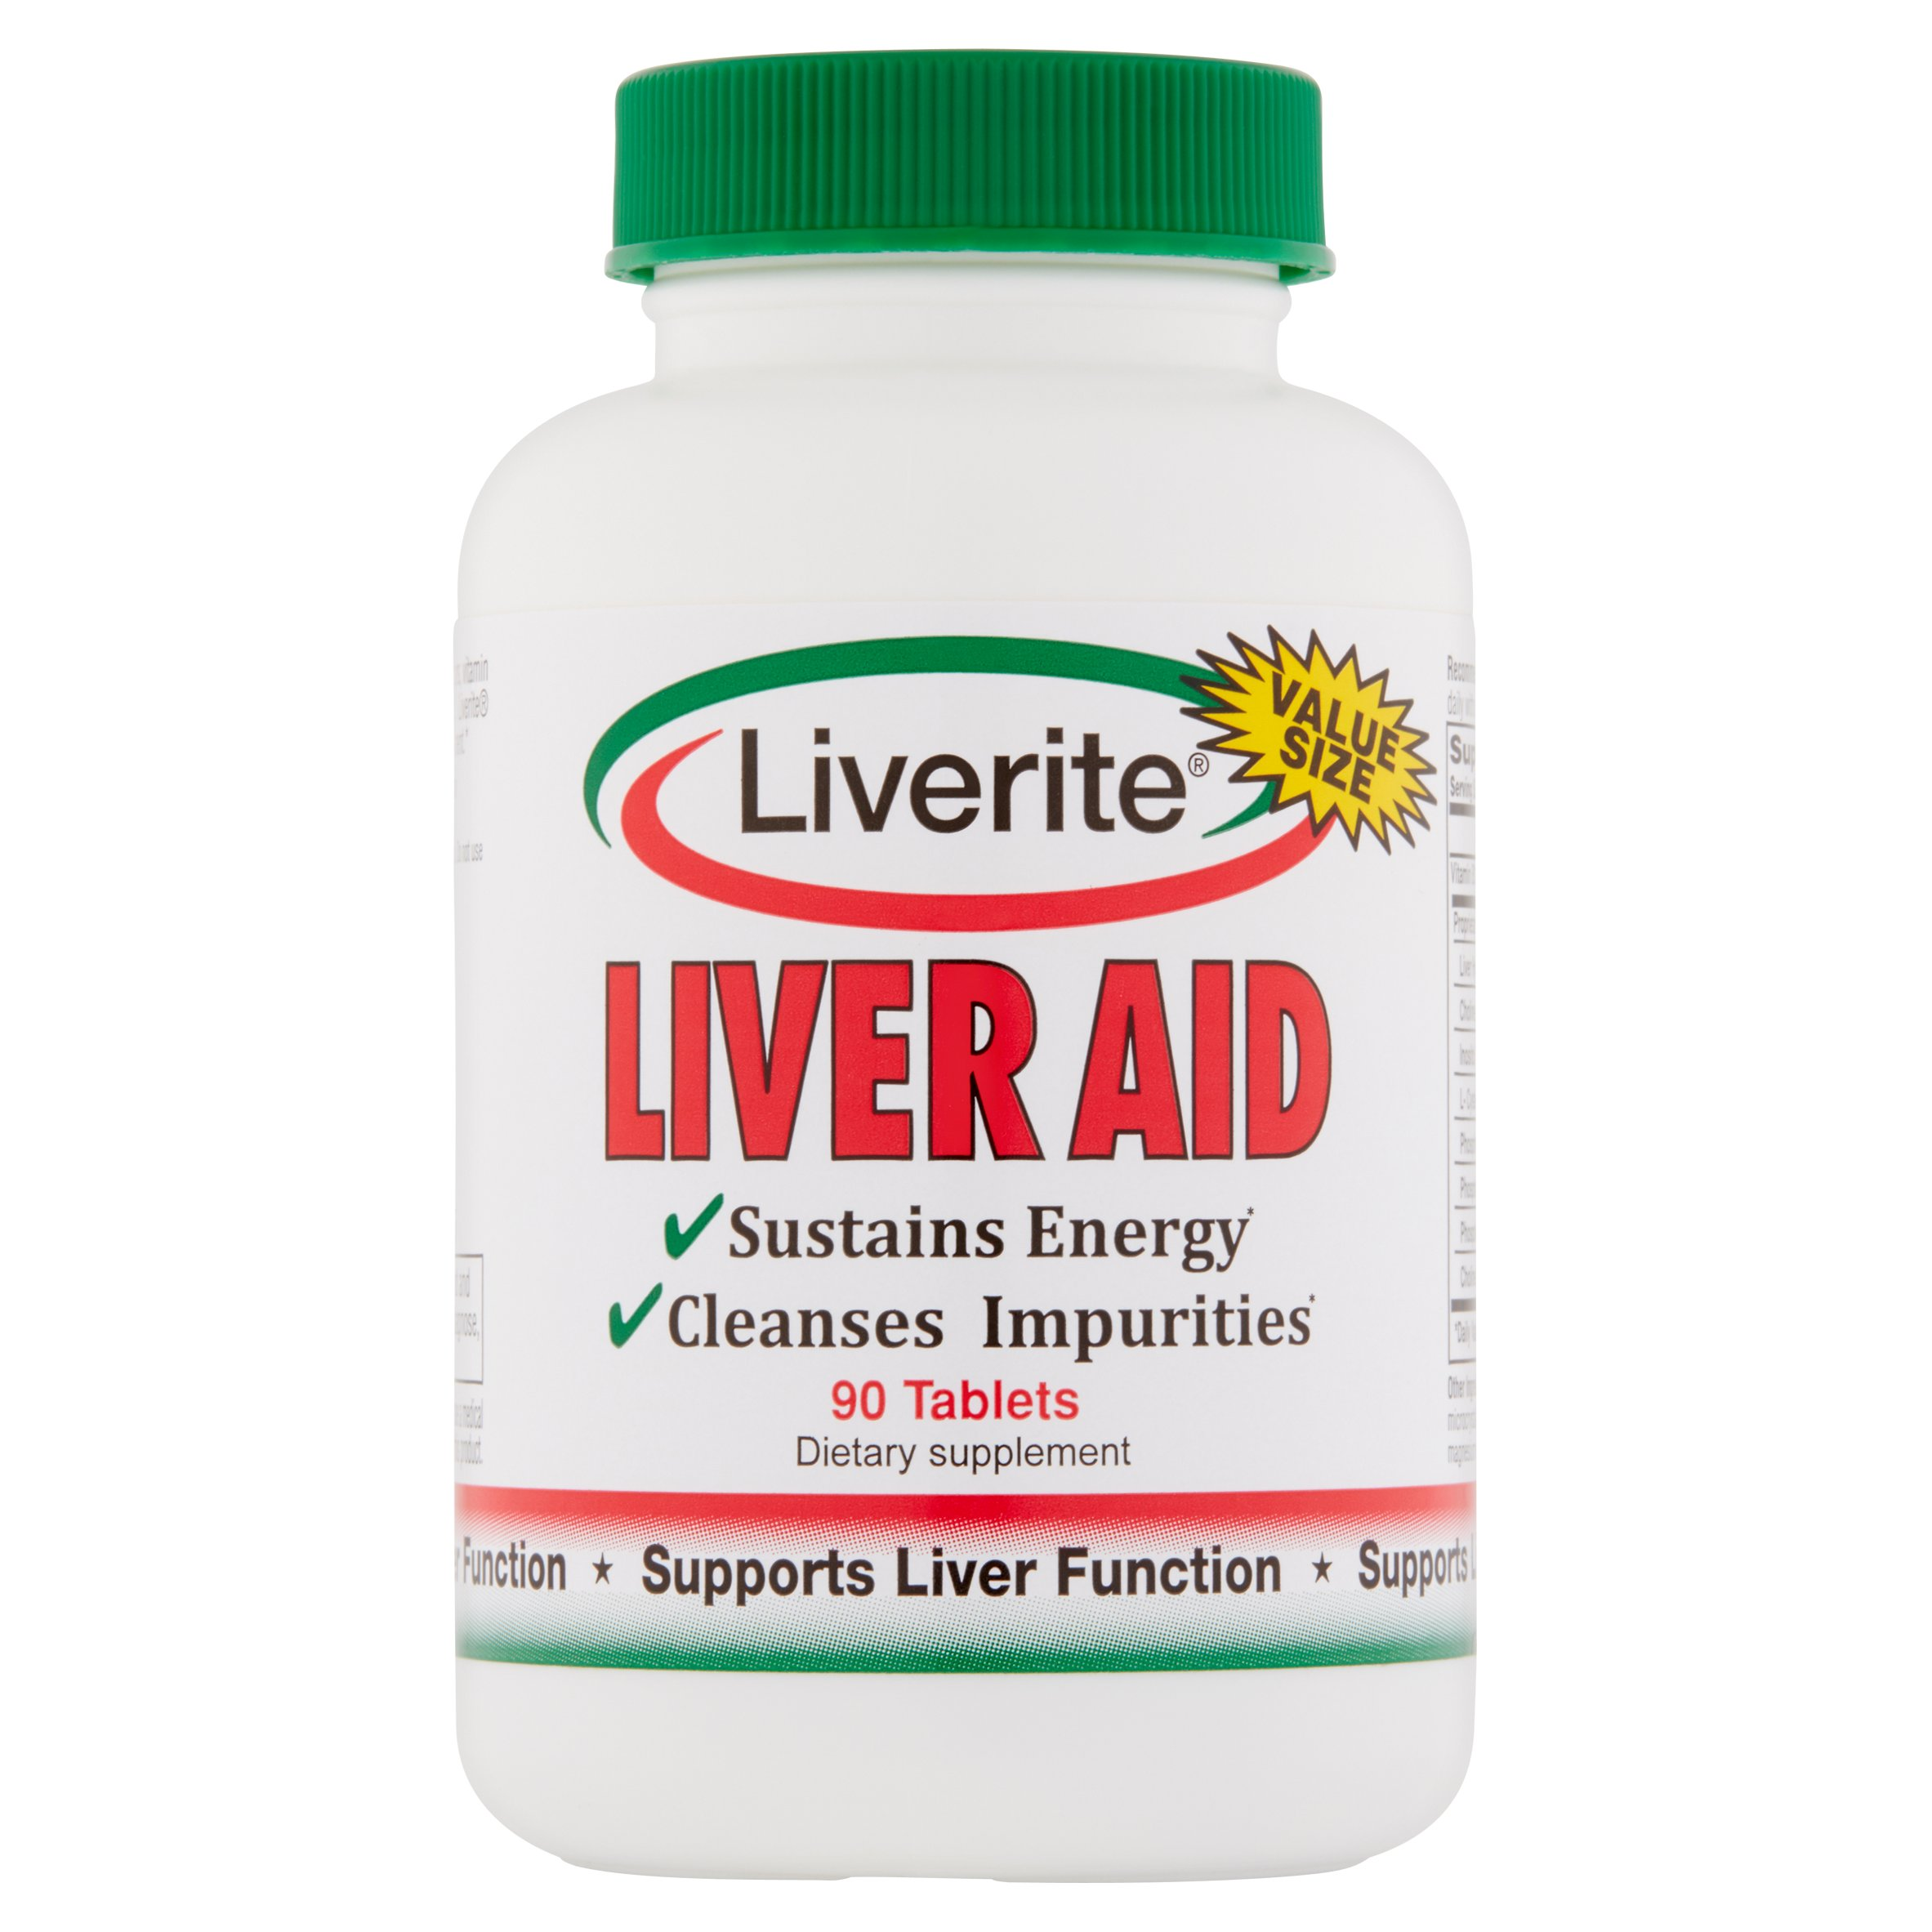 Liverite Liver Aid Value Size Tablets, 90 count